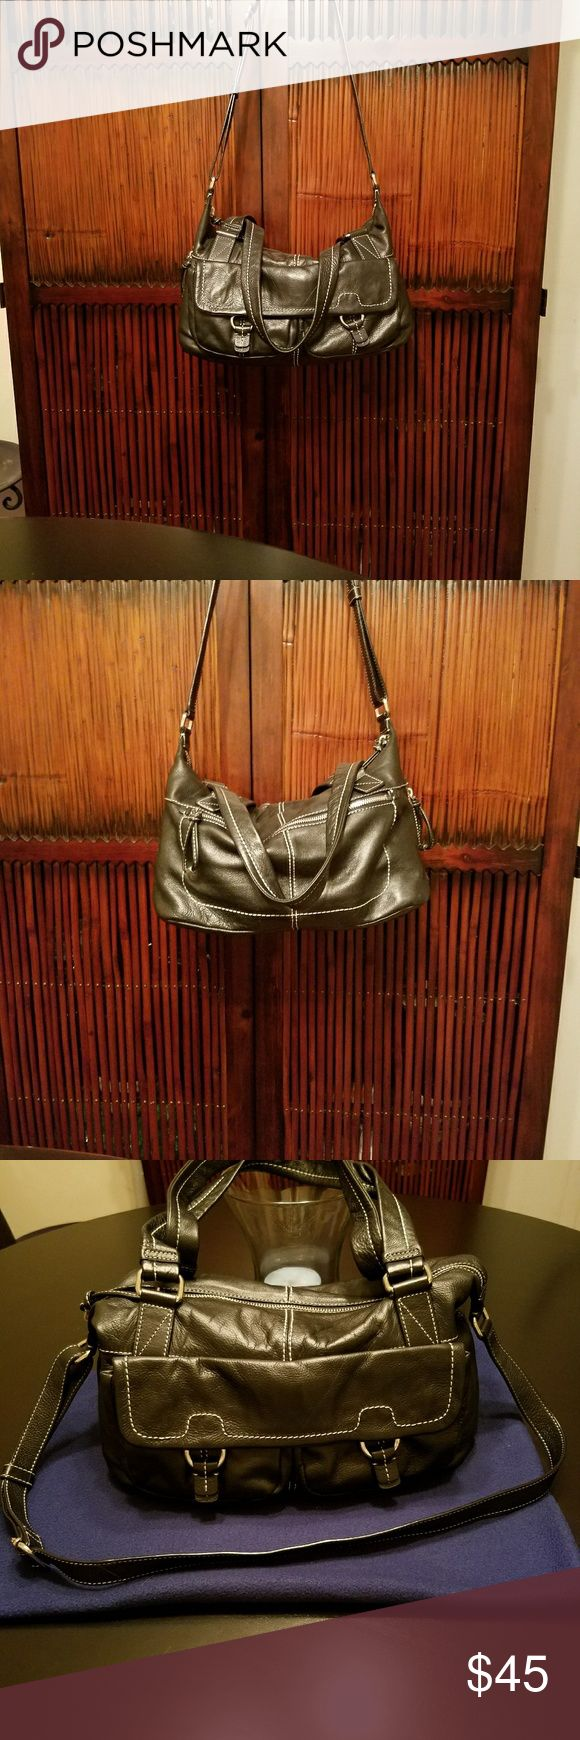 Selling this Banana Republic - Black Leather Satchel on Poshmark! My username is: hulaberry72. #shopmycloset #poshmark #fashion #shopping #style #forsale #Banana Republic #Handbags